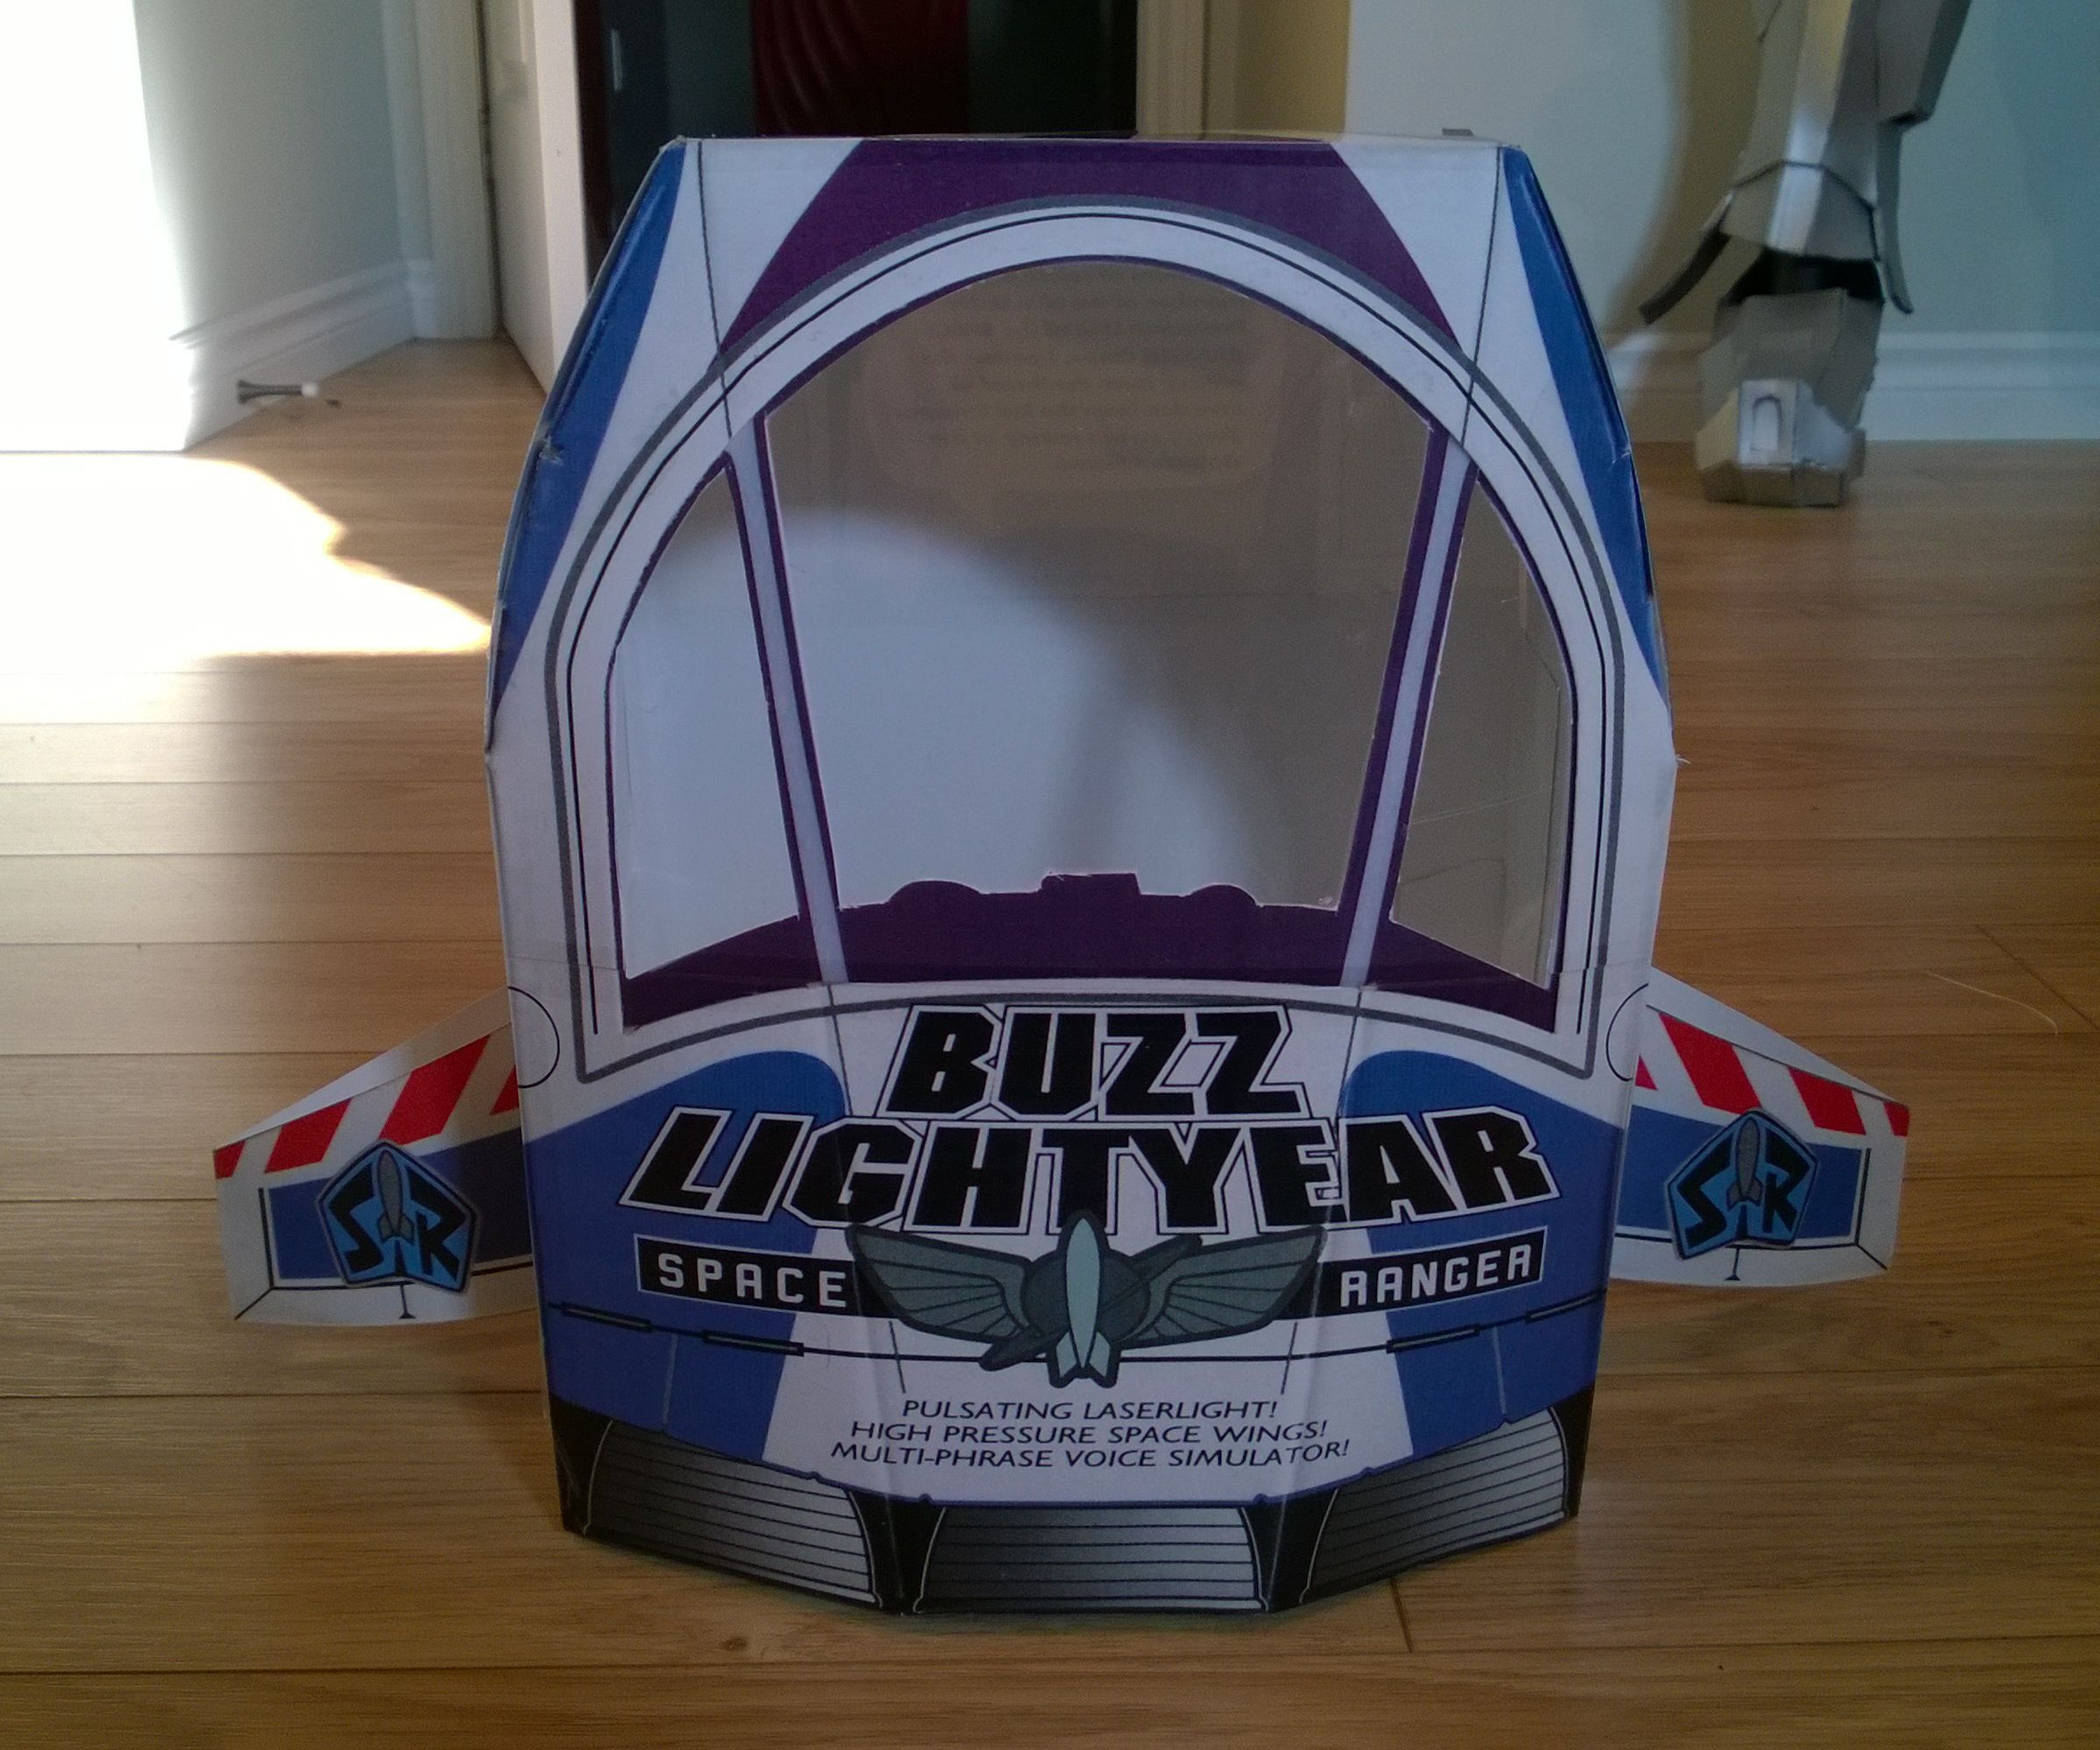 Buzz Lightyear's box (Spaceship)